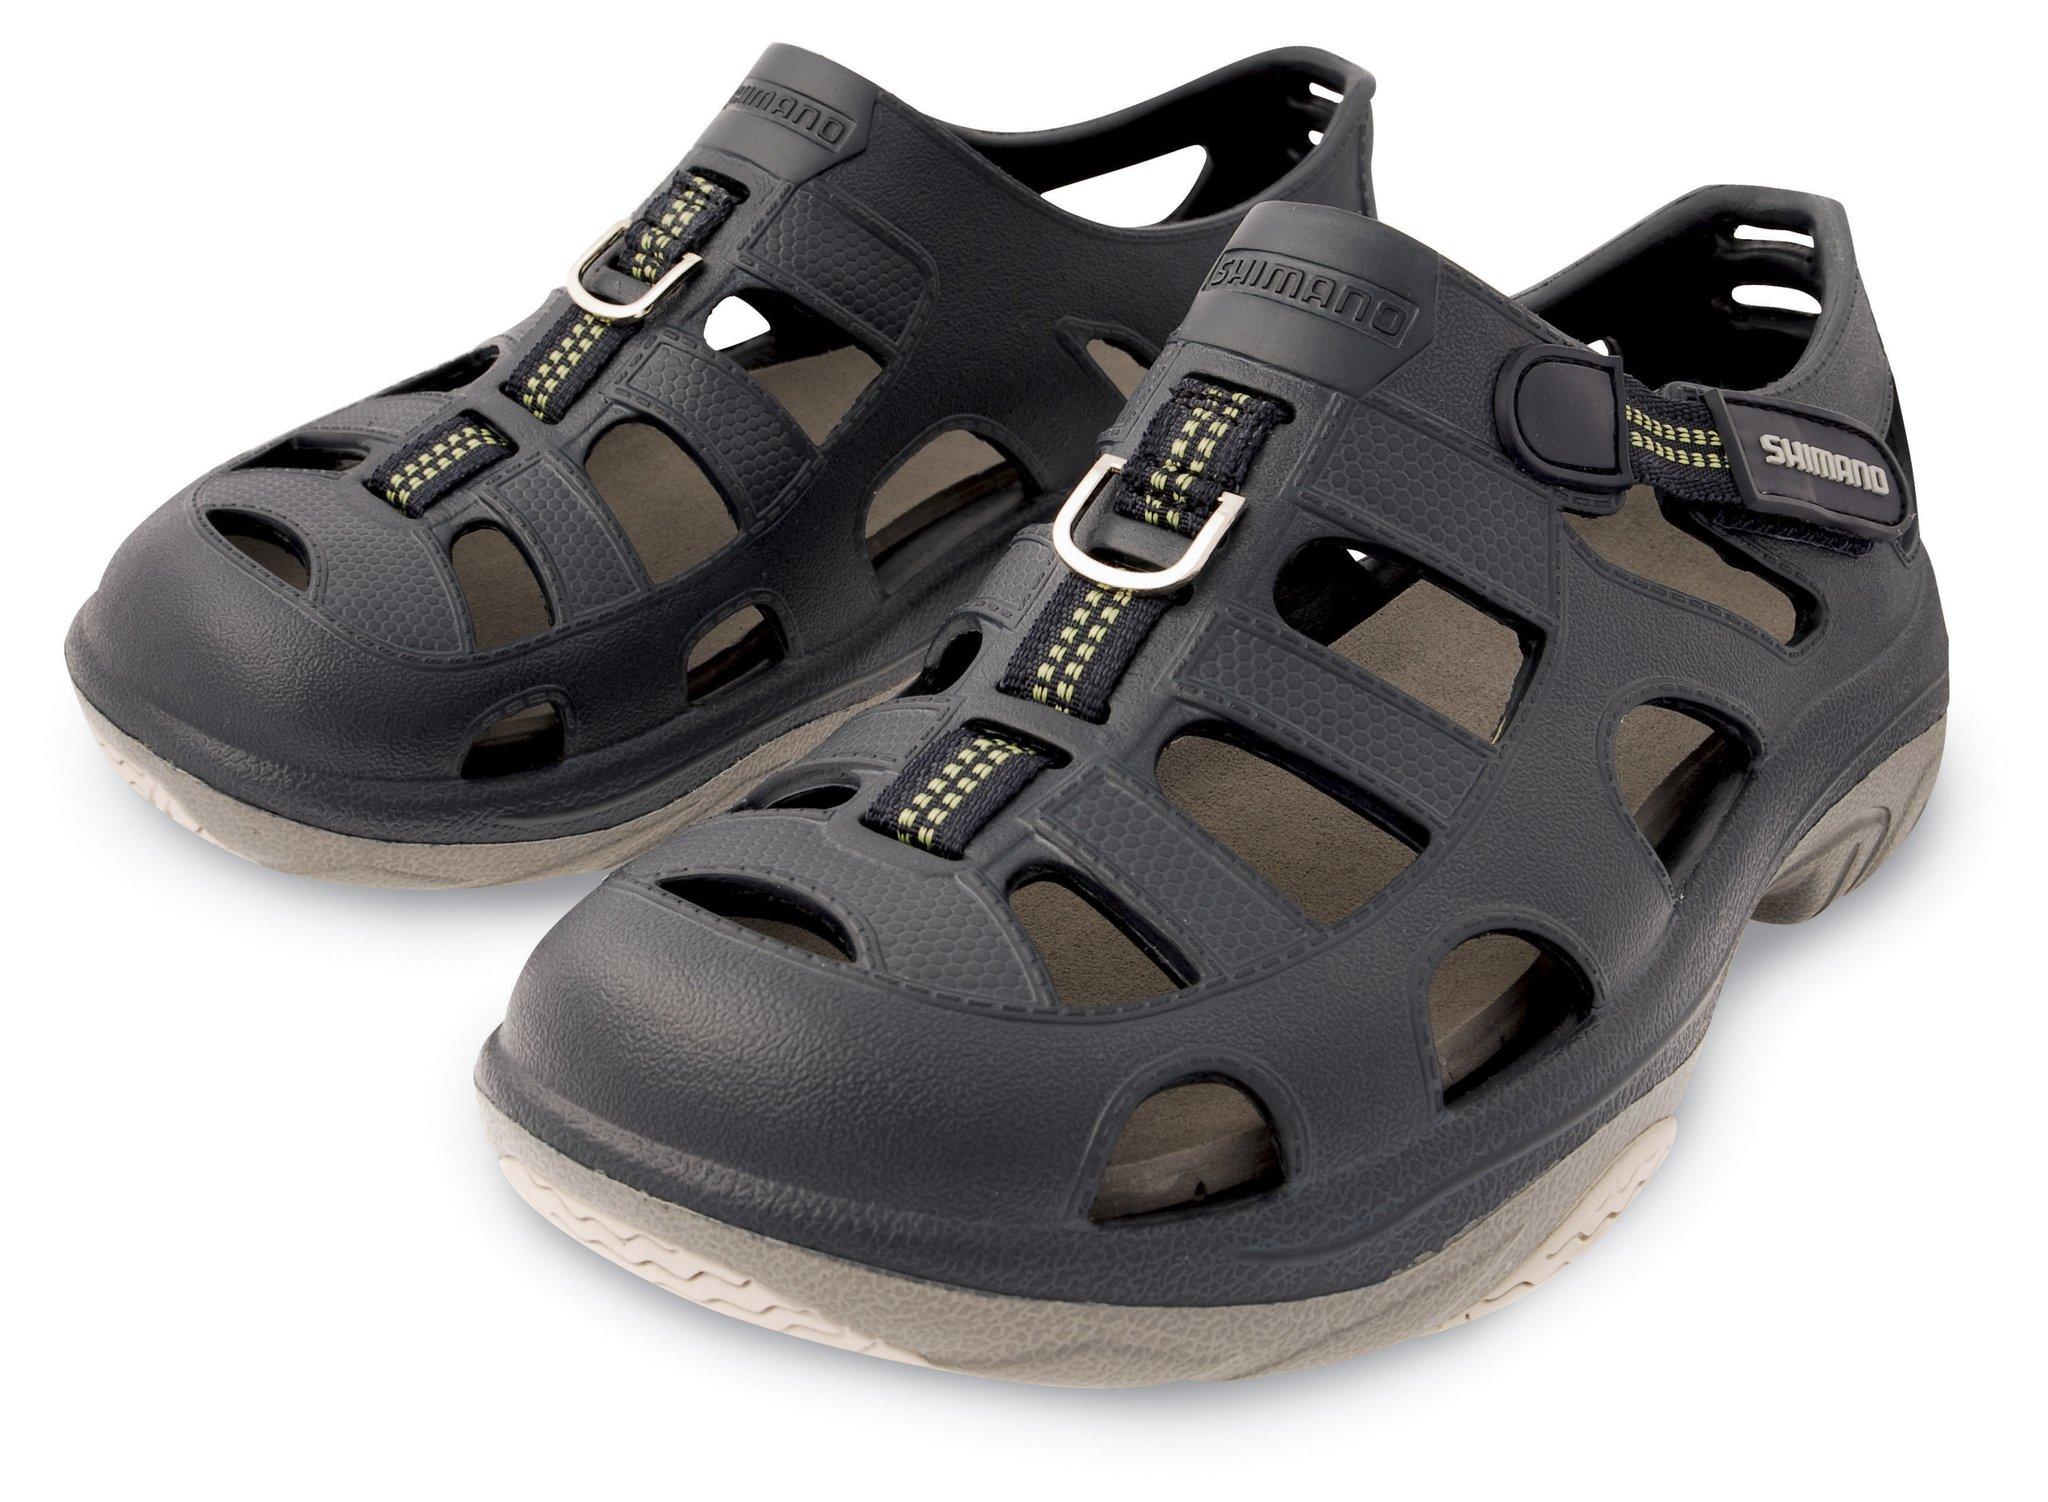 SHIMANO Evair Marine Fishing Shoes; Size 09; Navy/Gray by SHIMANO